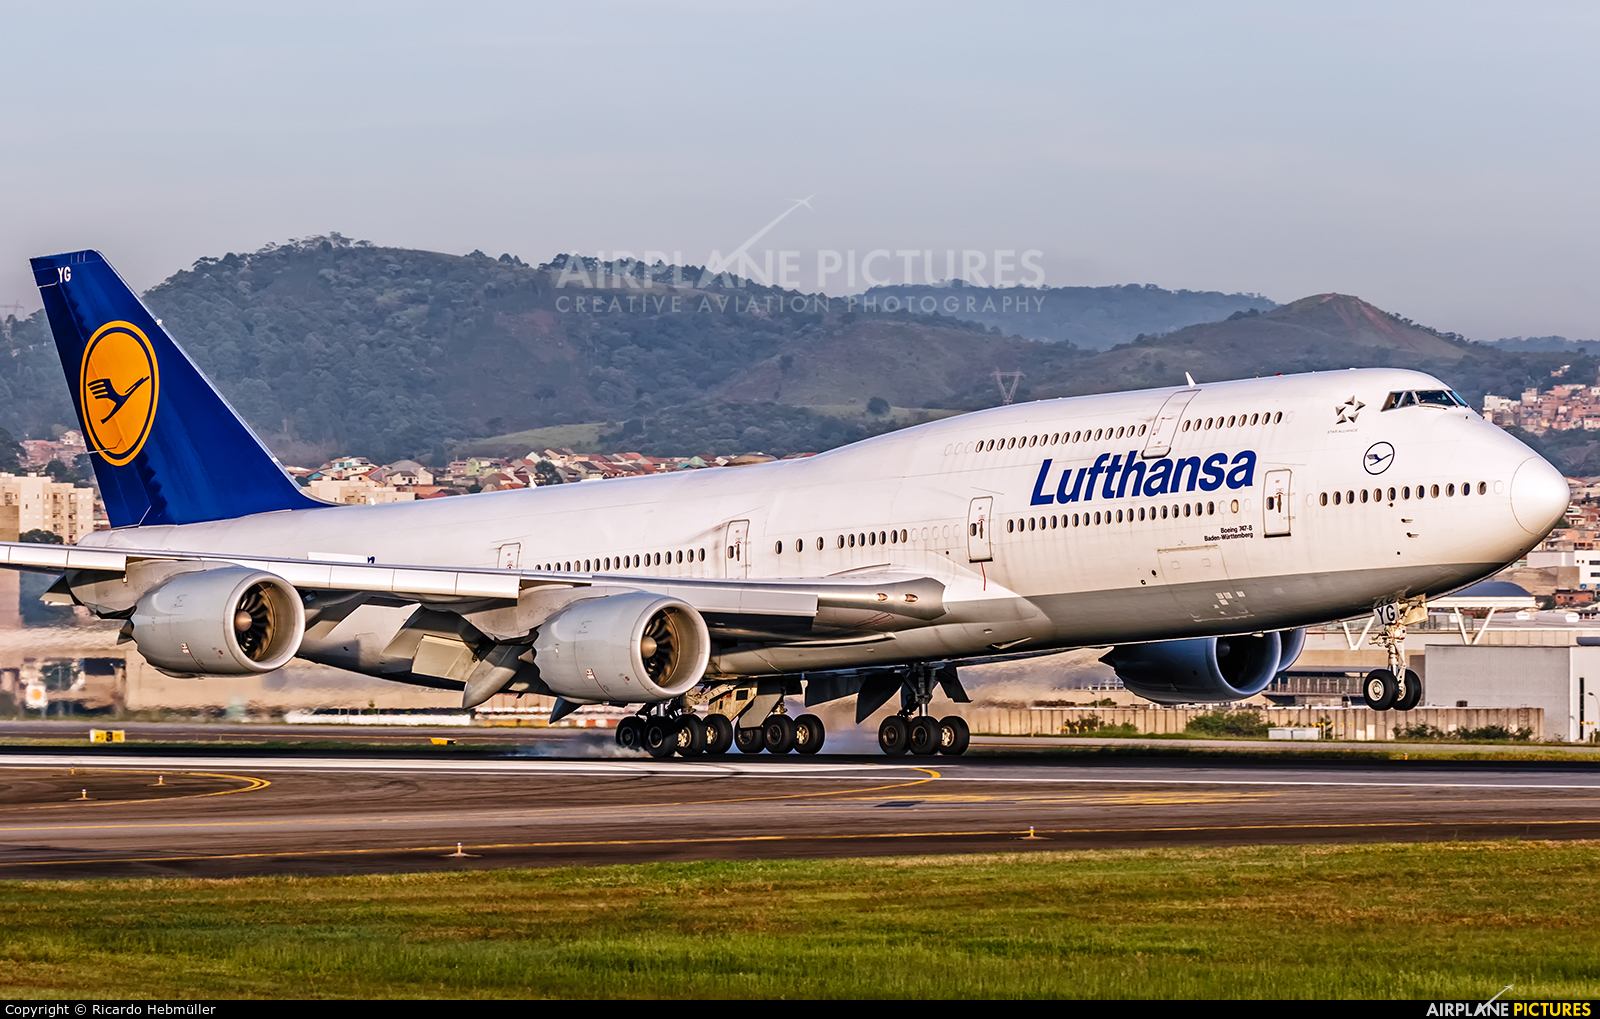 Lufthansa D-ABYG aircraft at São Paulo - Guarulhos